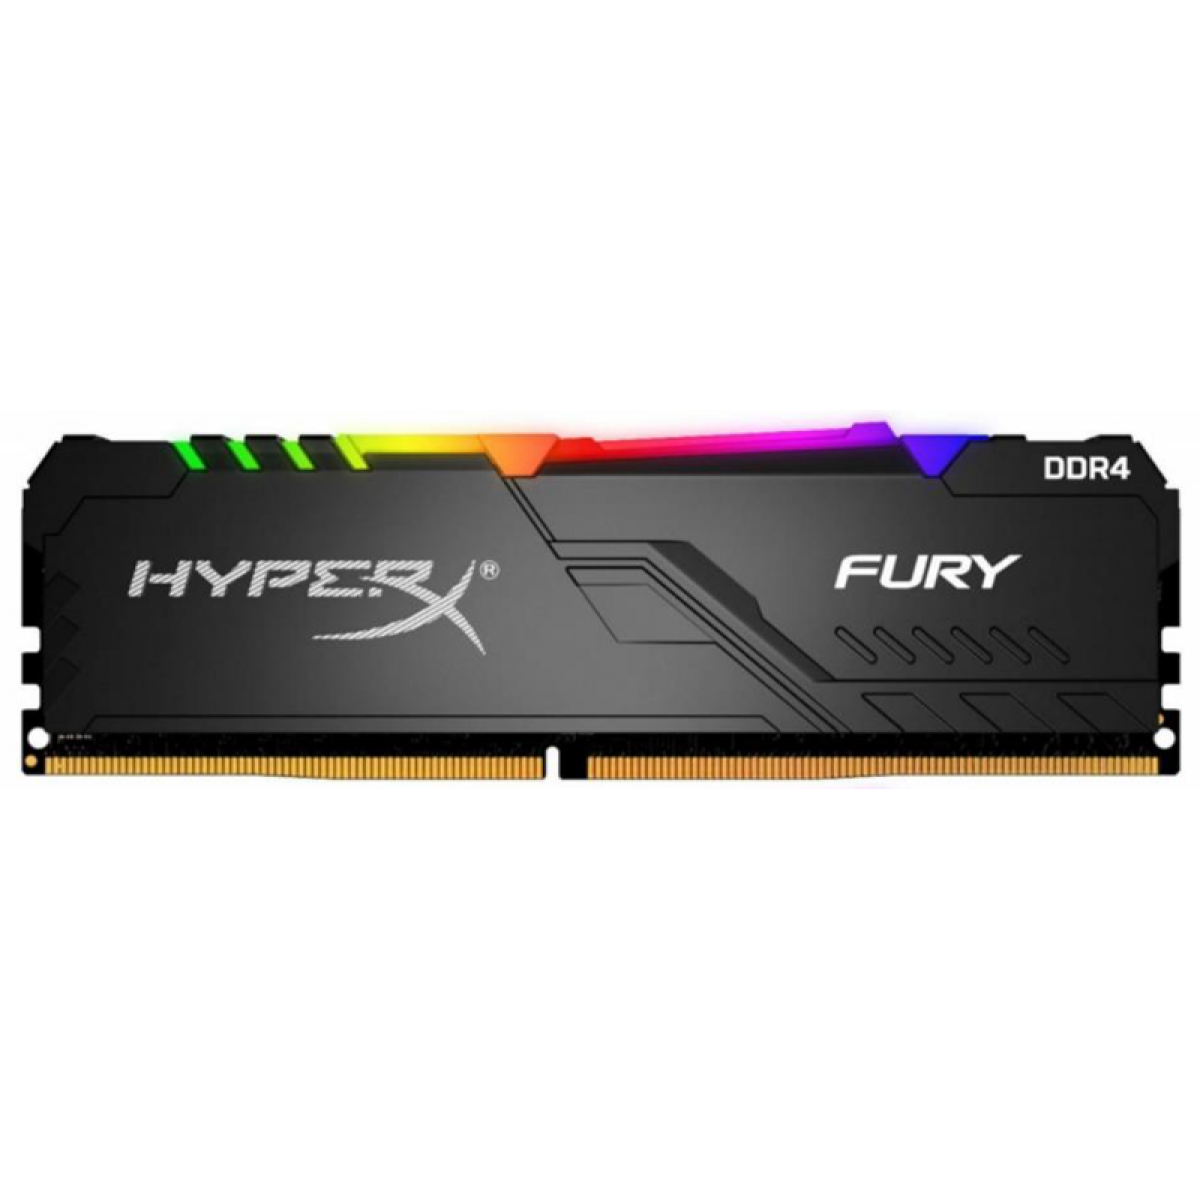 Memória DDR4 Kingston HyperX Fury RGB, 8GB 3466MHz, Black, HX434C16FB3A/8